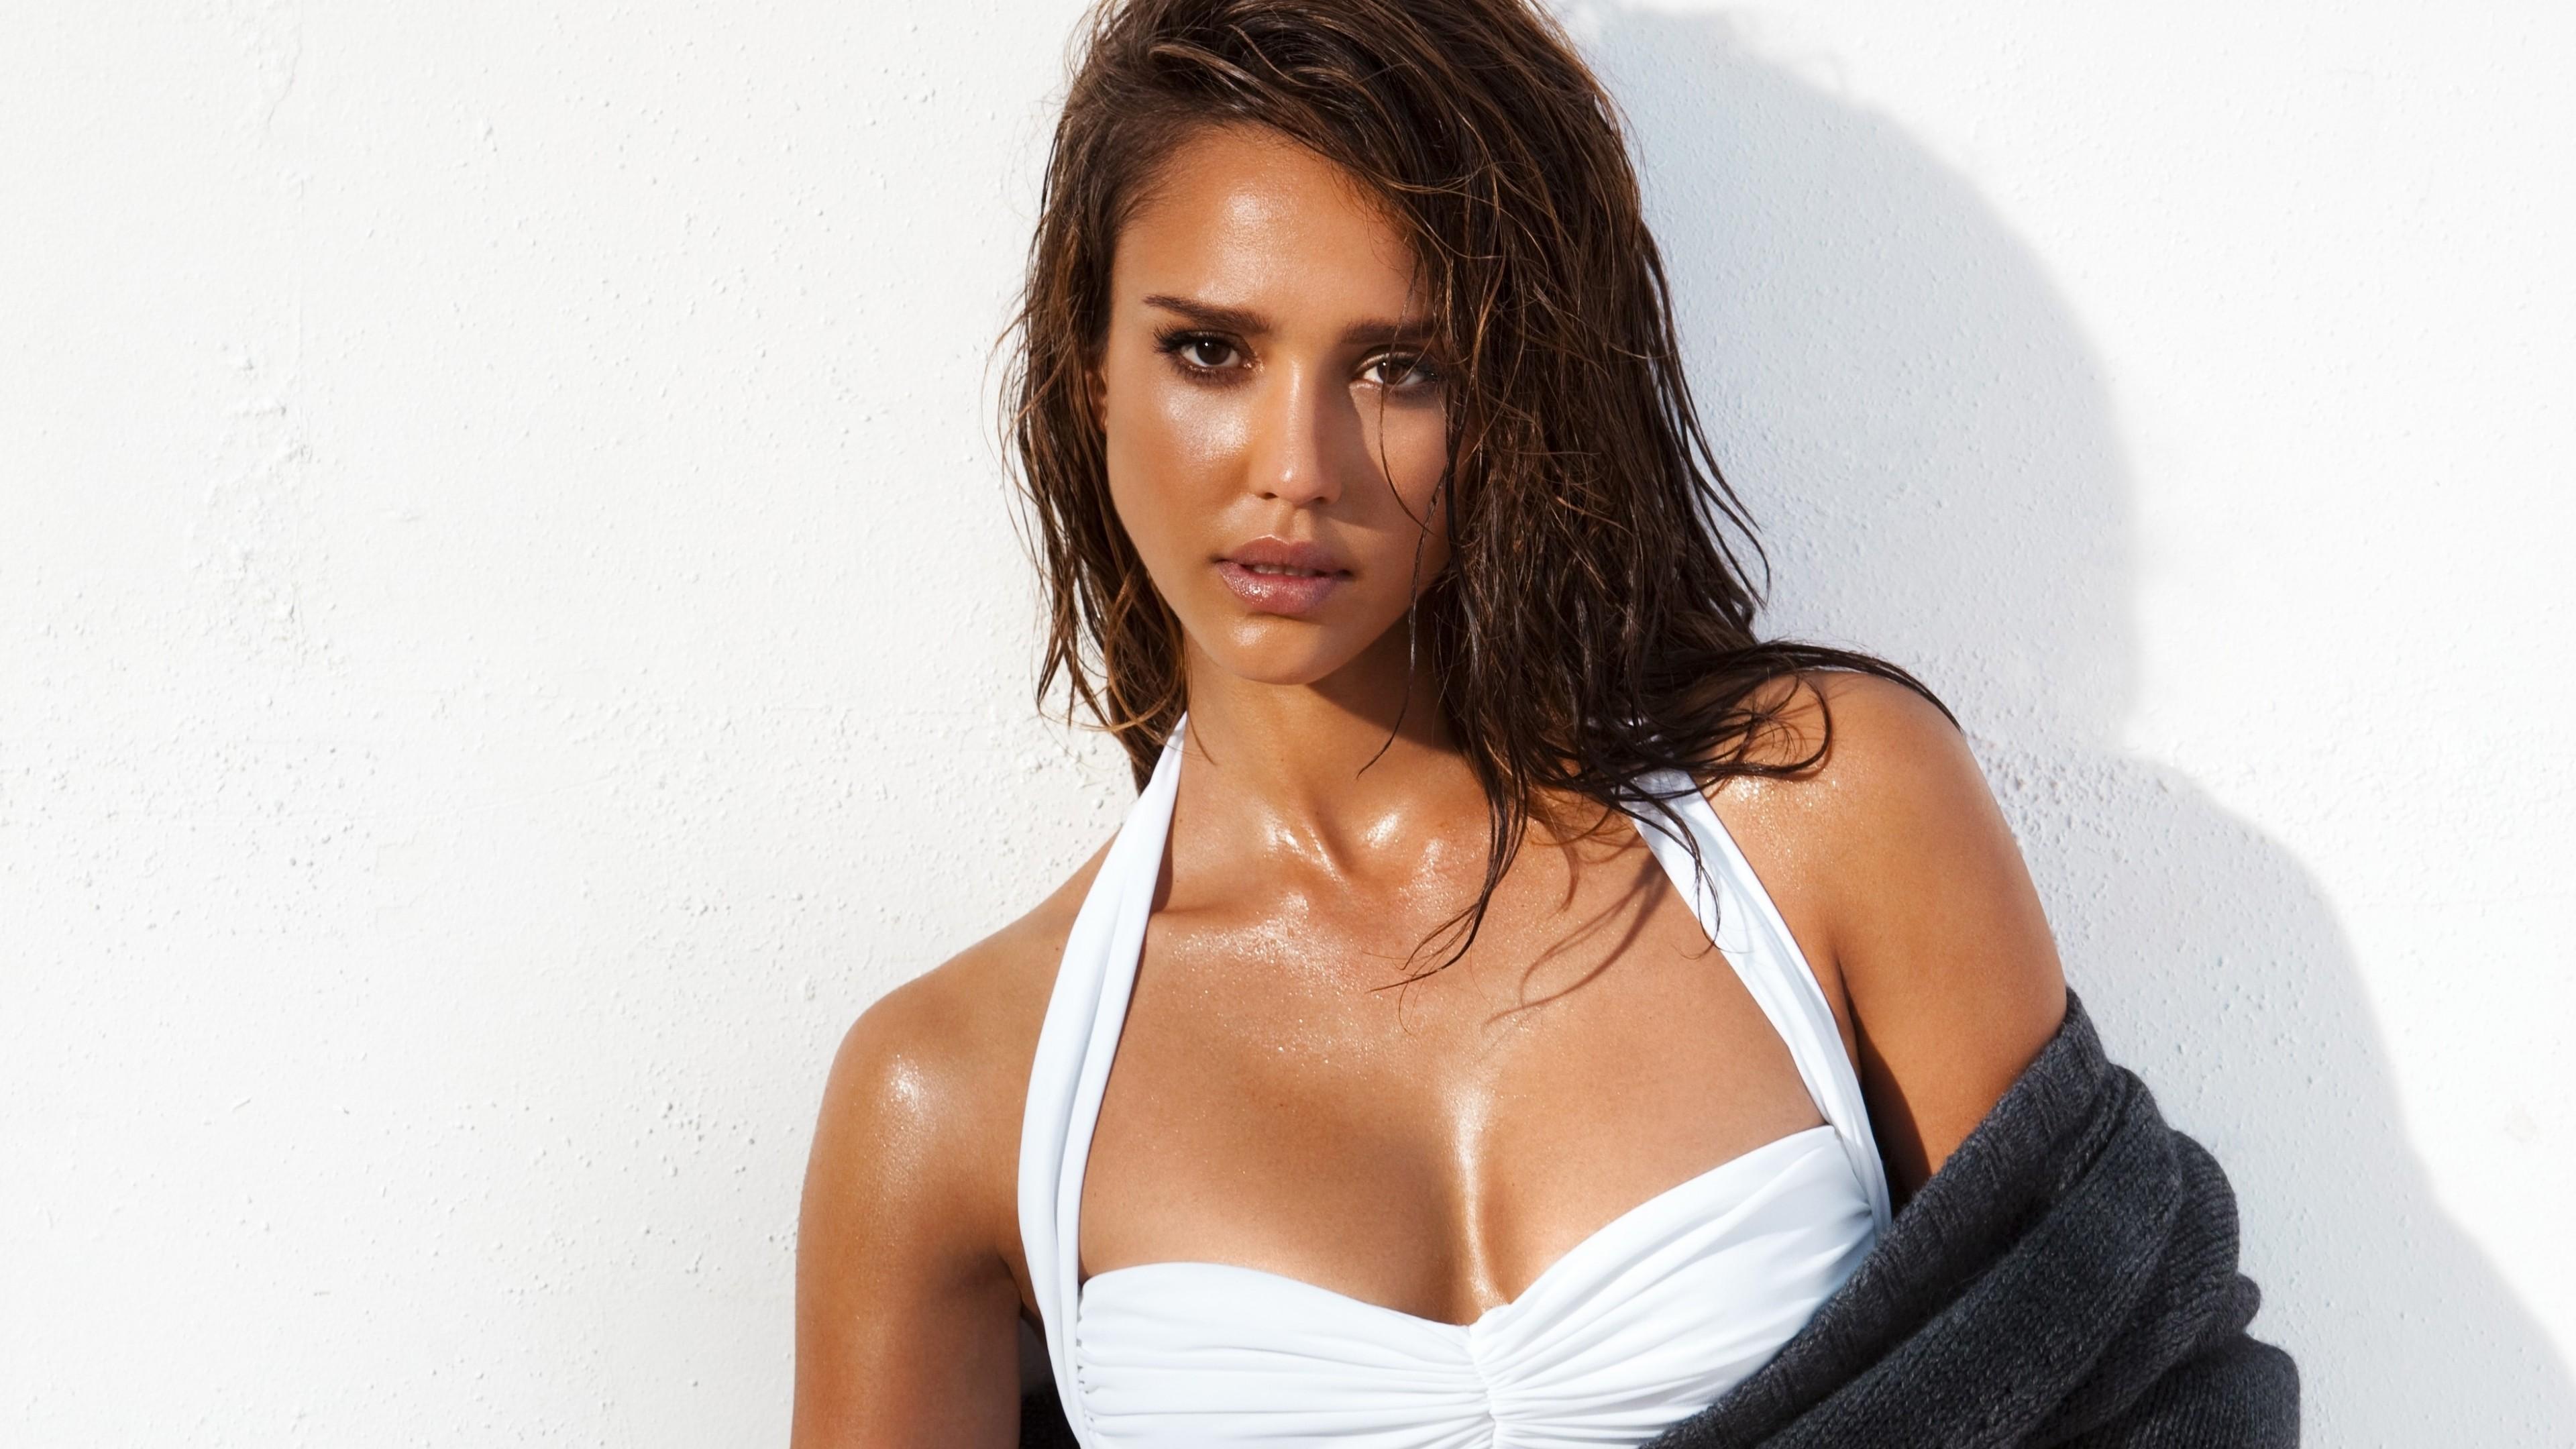 Hollywood Actress Hot Wallpapers Gallery: Hollywood Hot